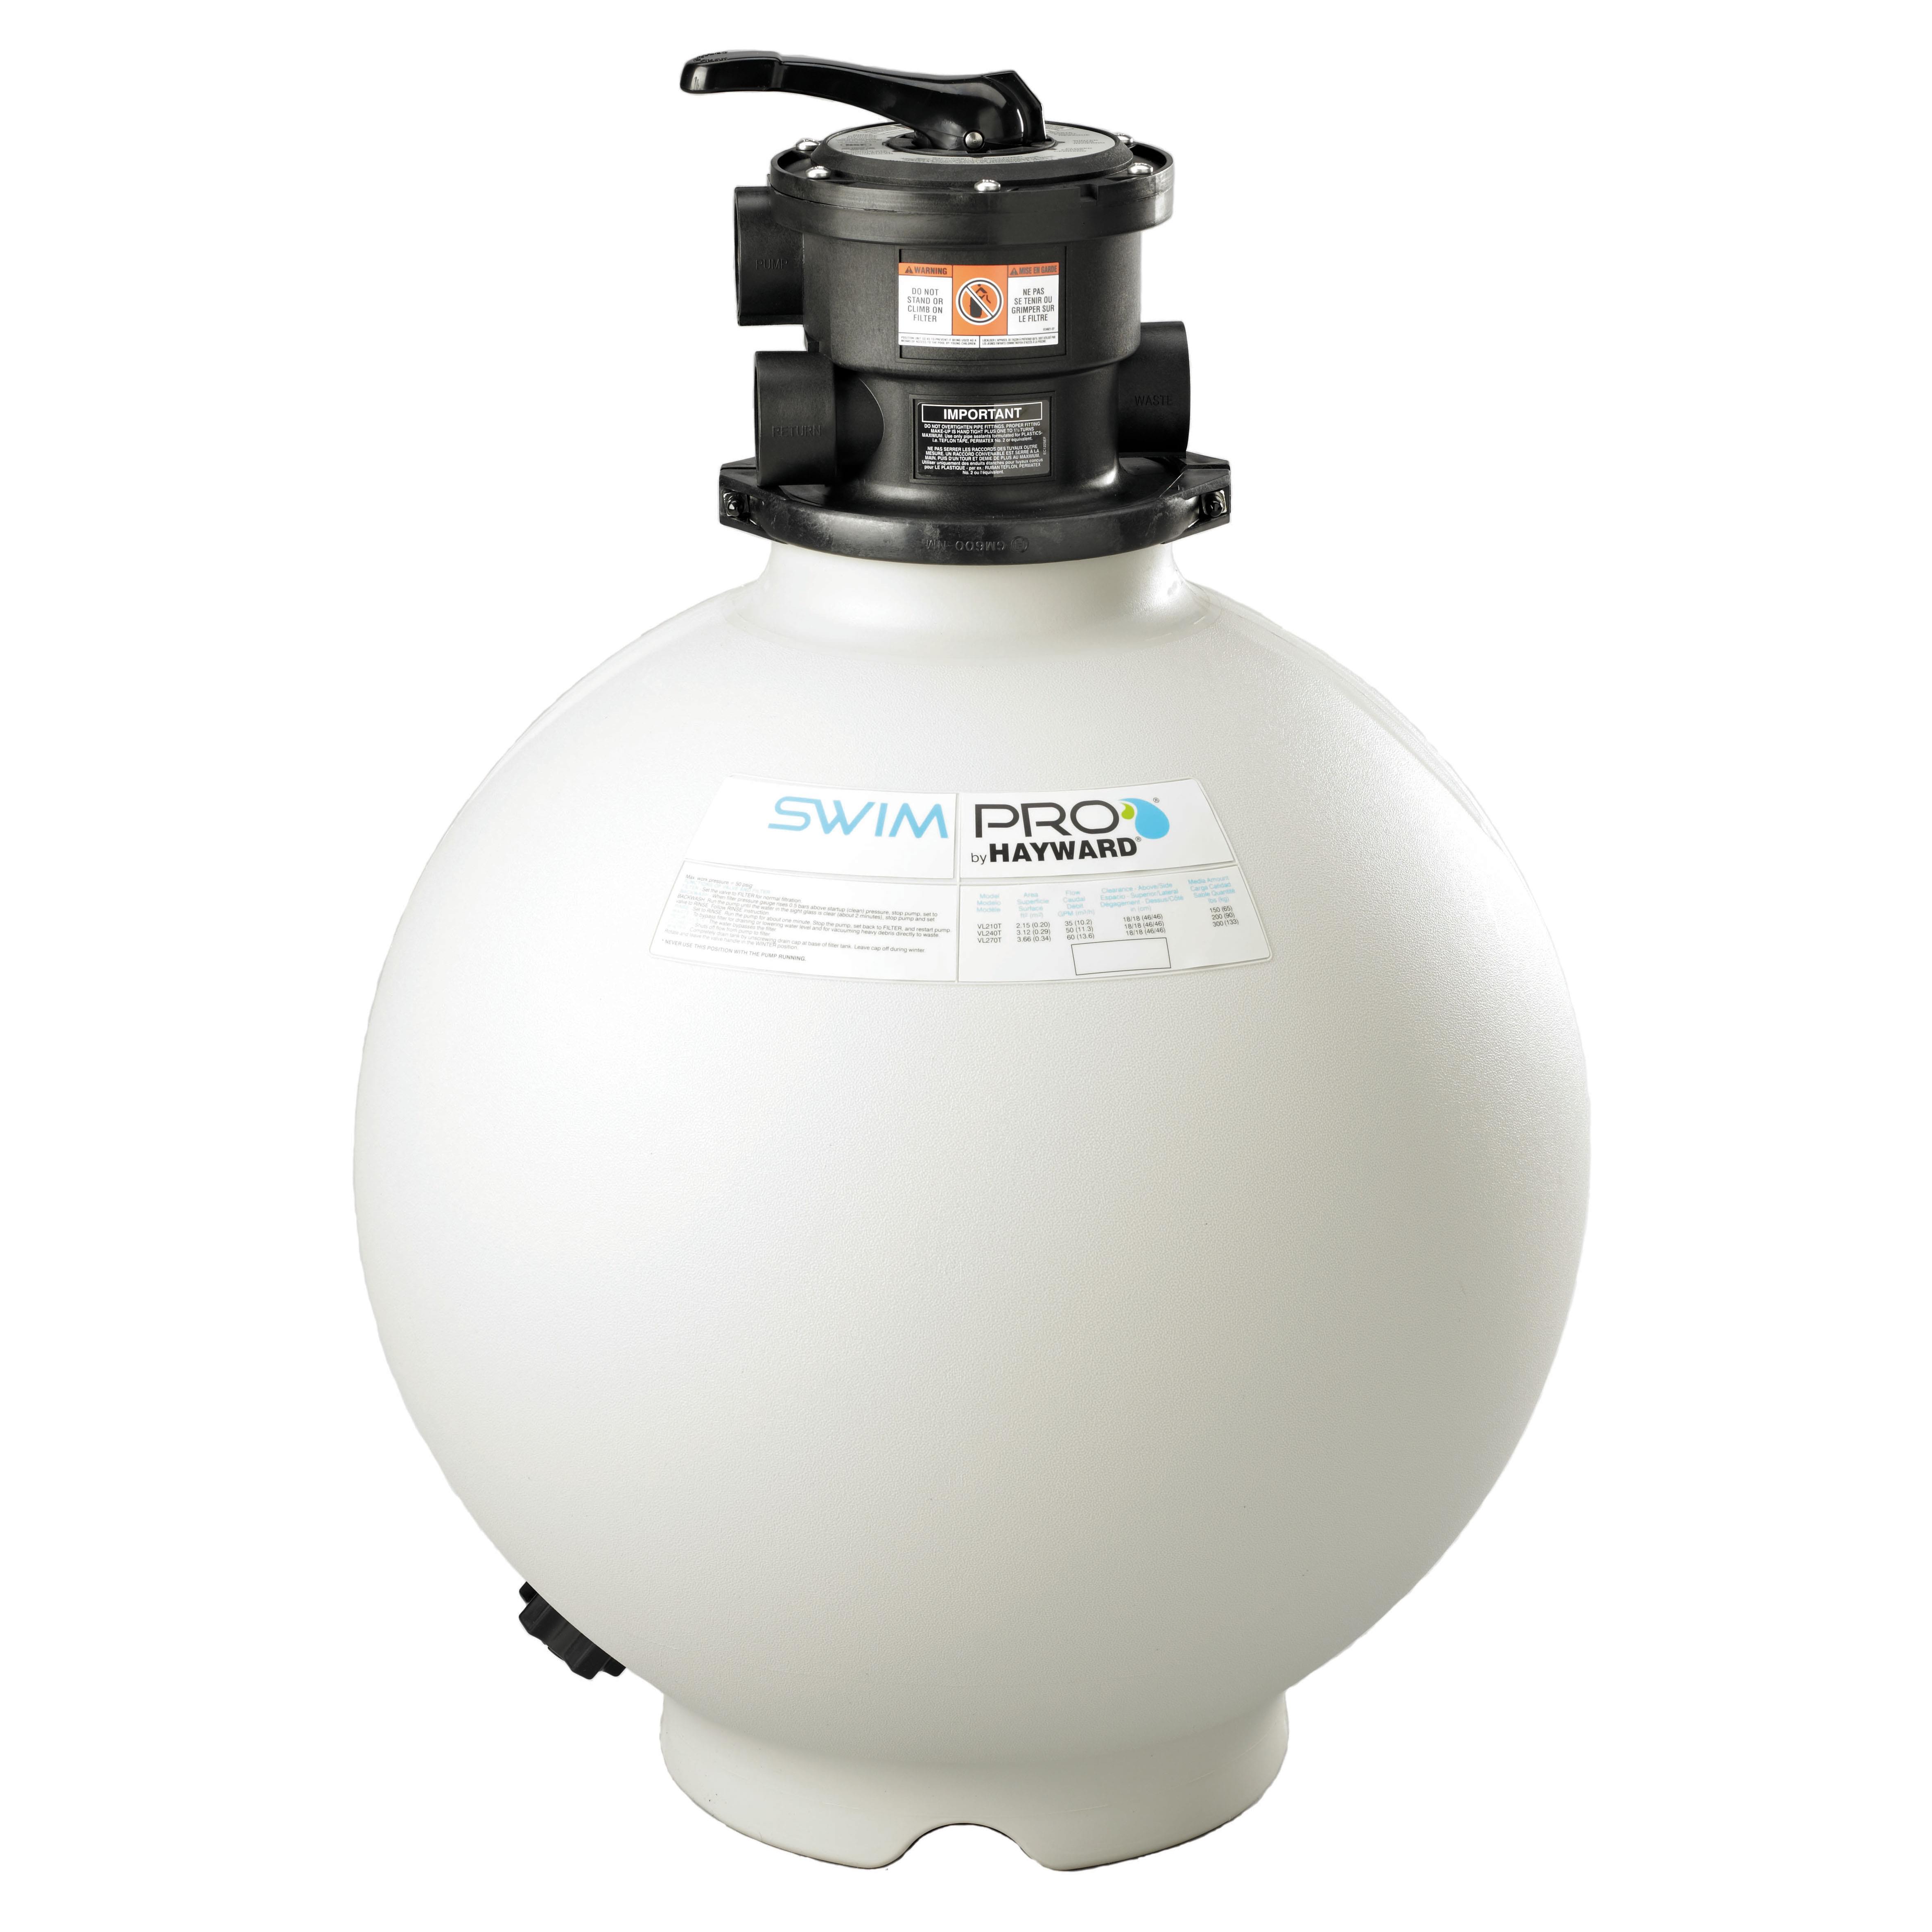 Hayward 27 inch swim pro sand filter with 6 way valve - Hayward swimming pool ...